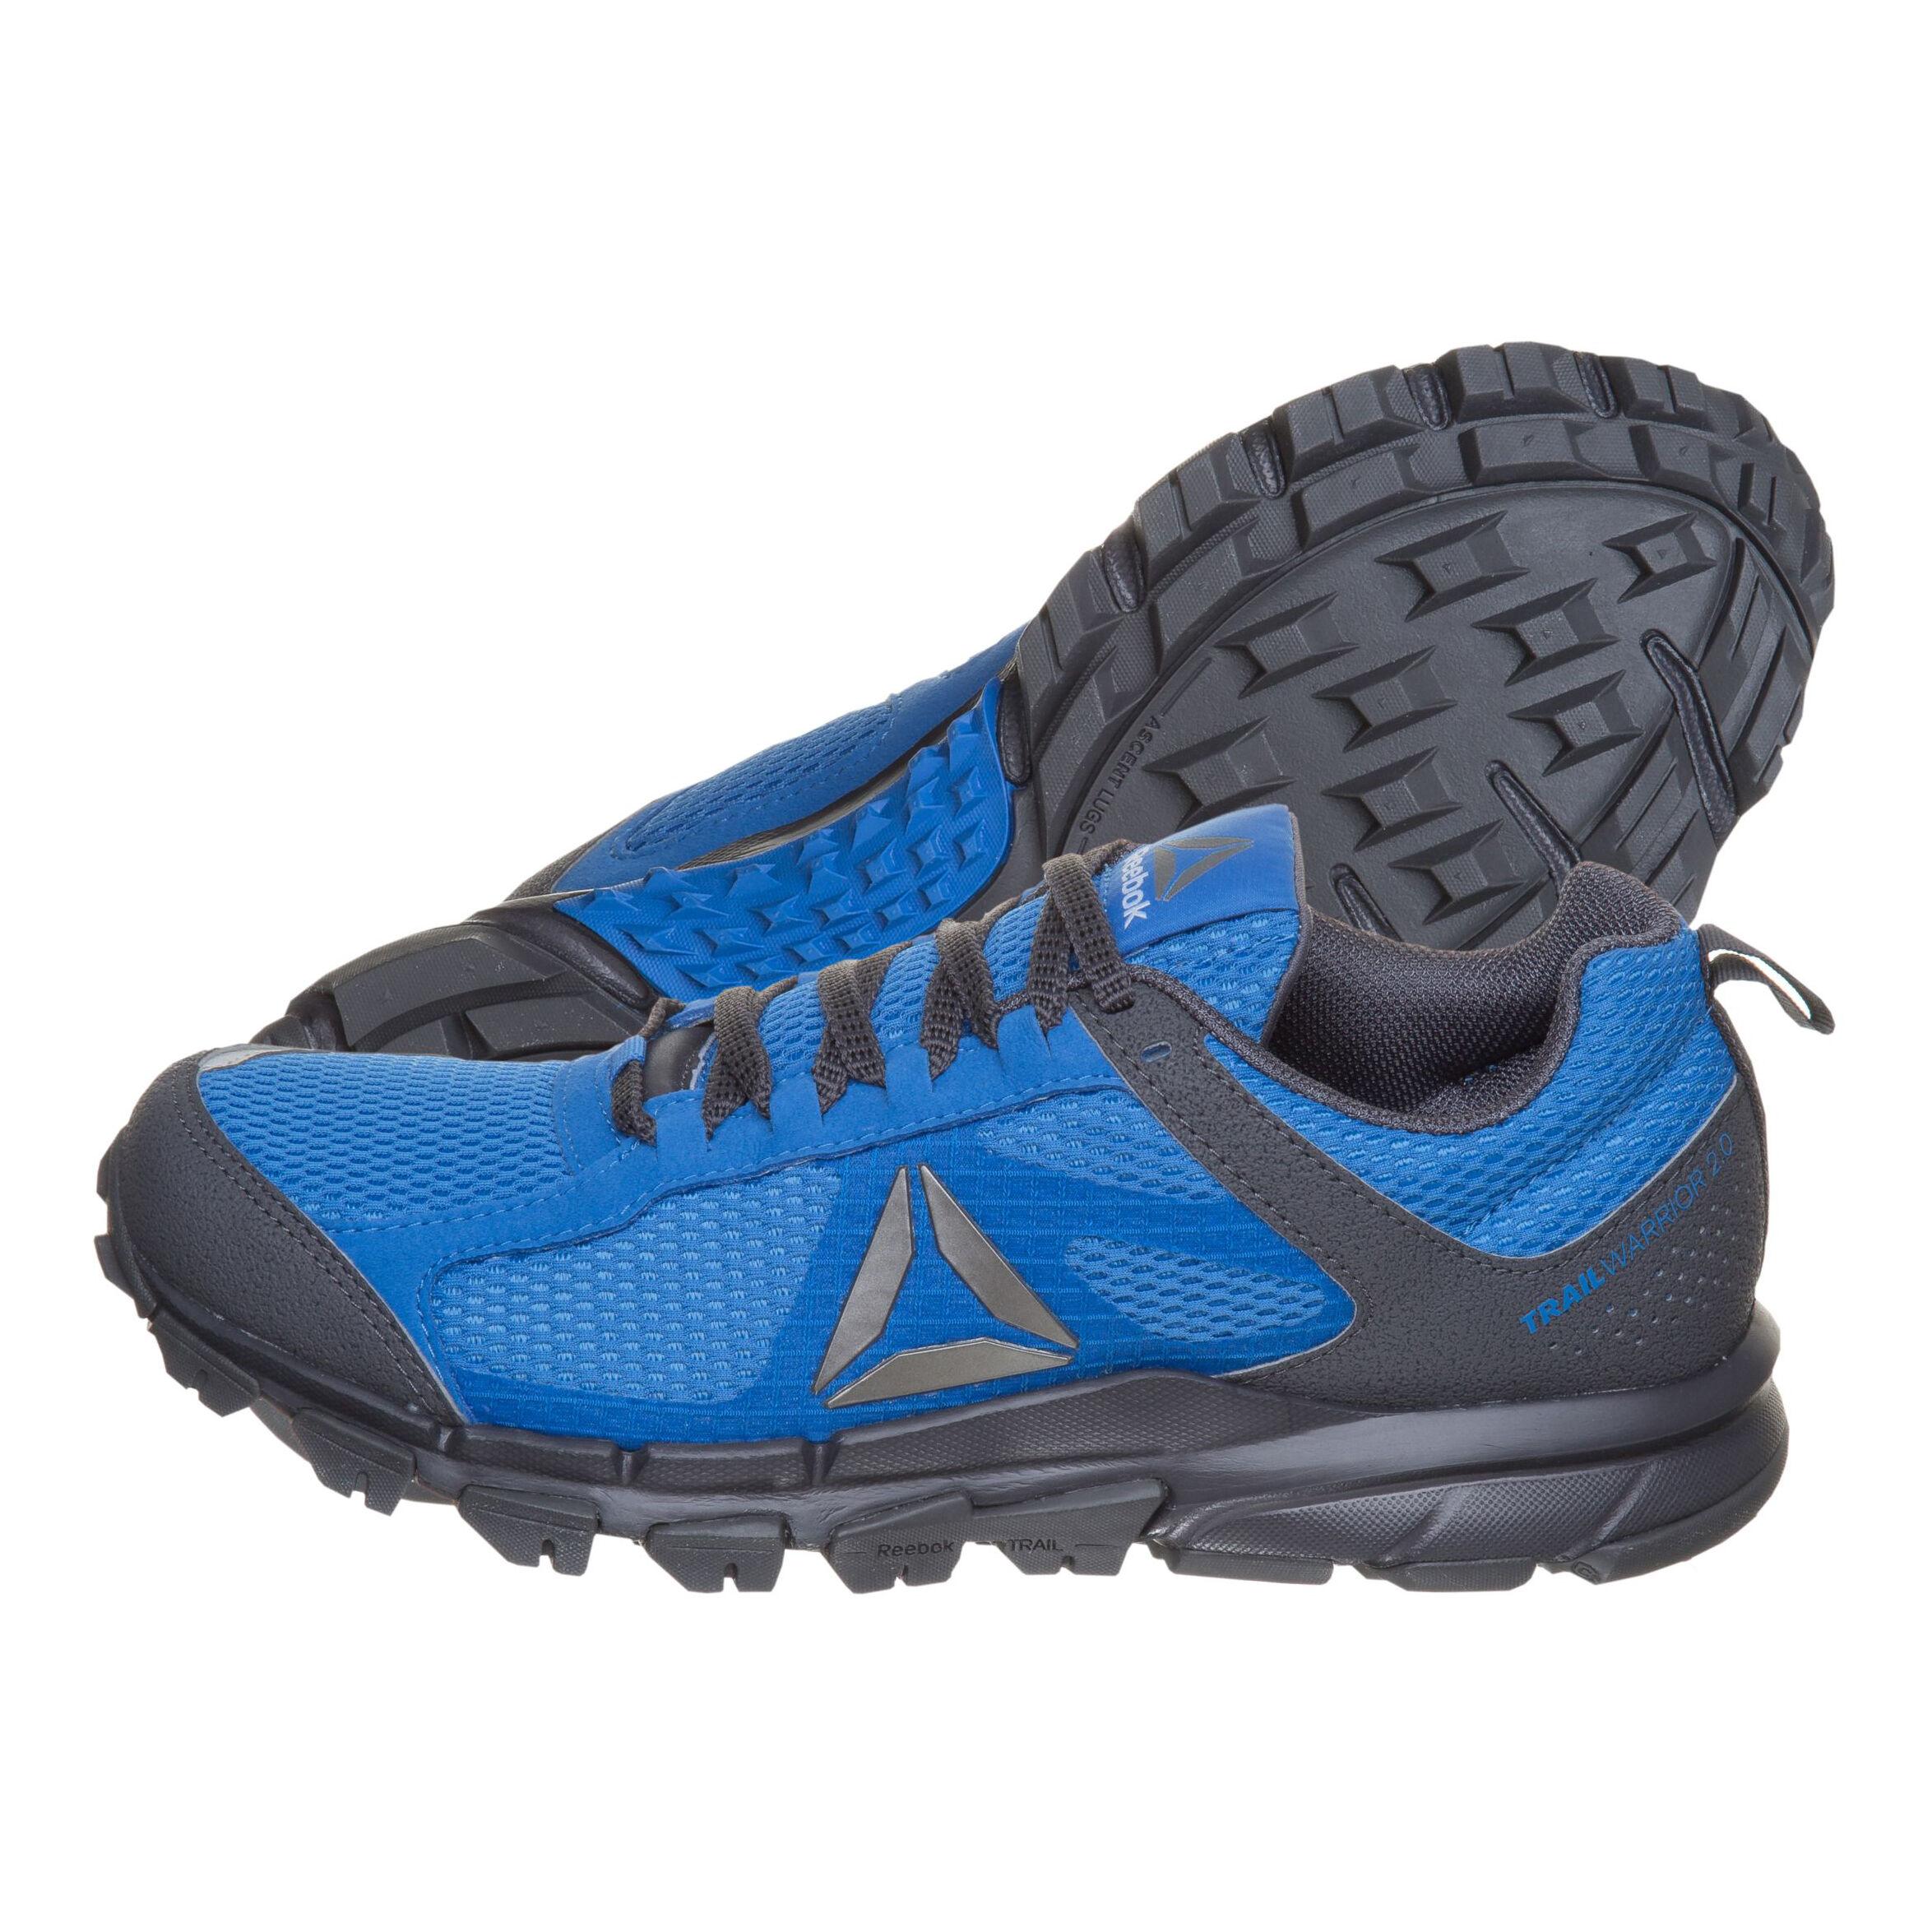 Reebok Running Shoes Discount Trail Warrior 2.0 Womens Black